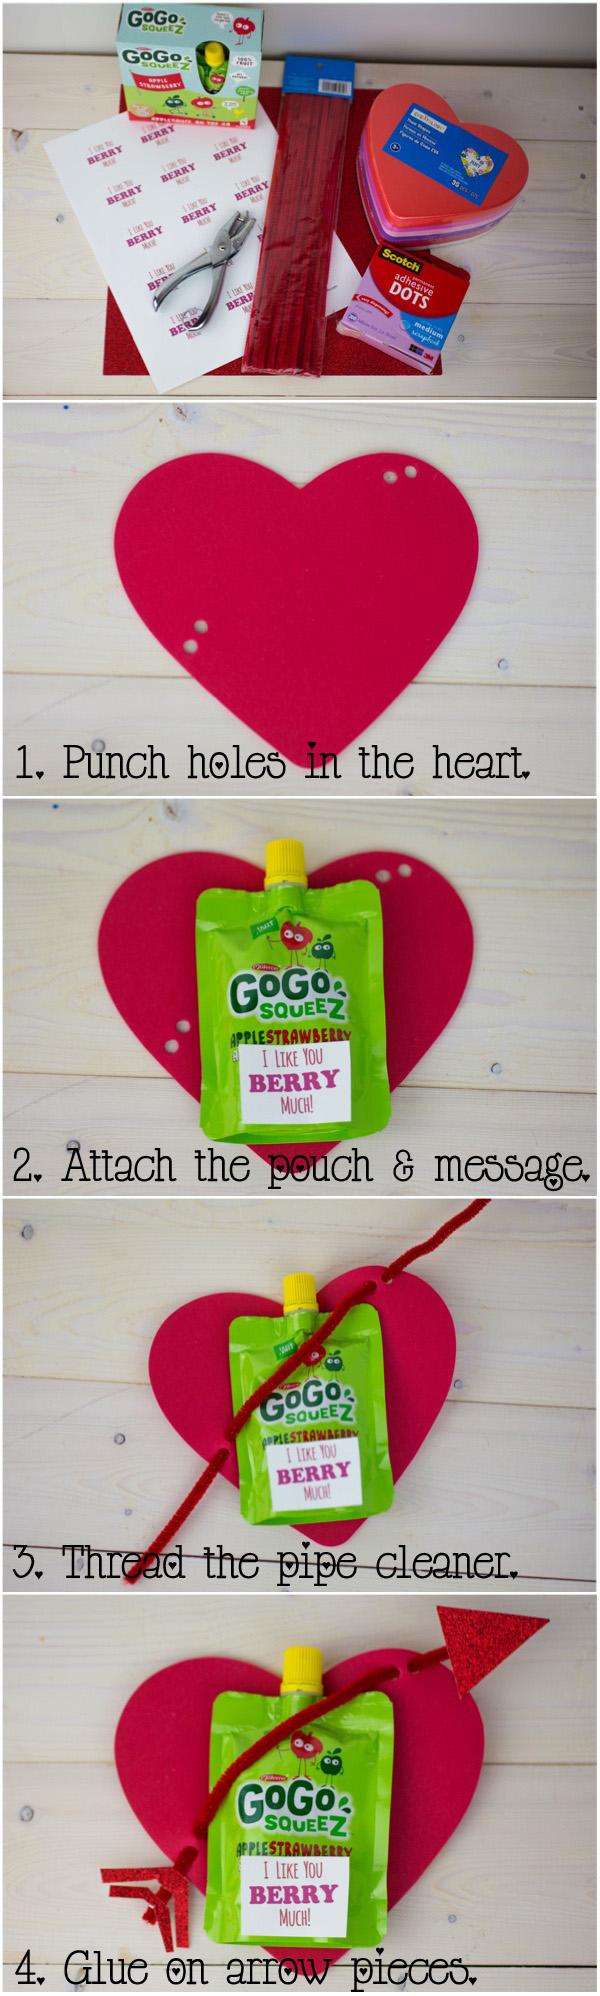 GoGo squeez Valentine Directions